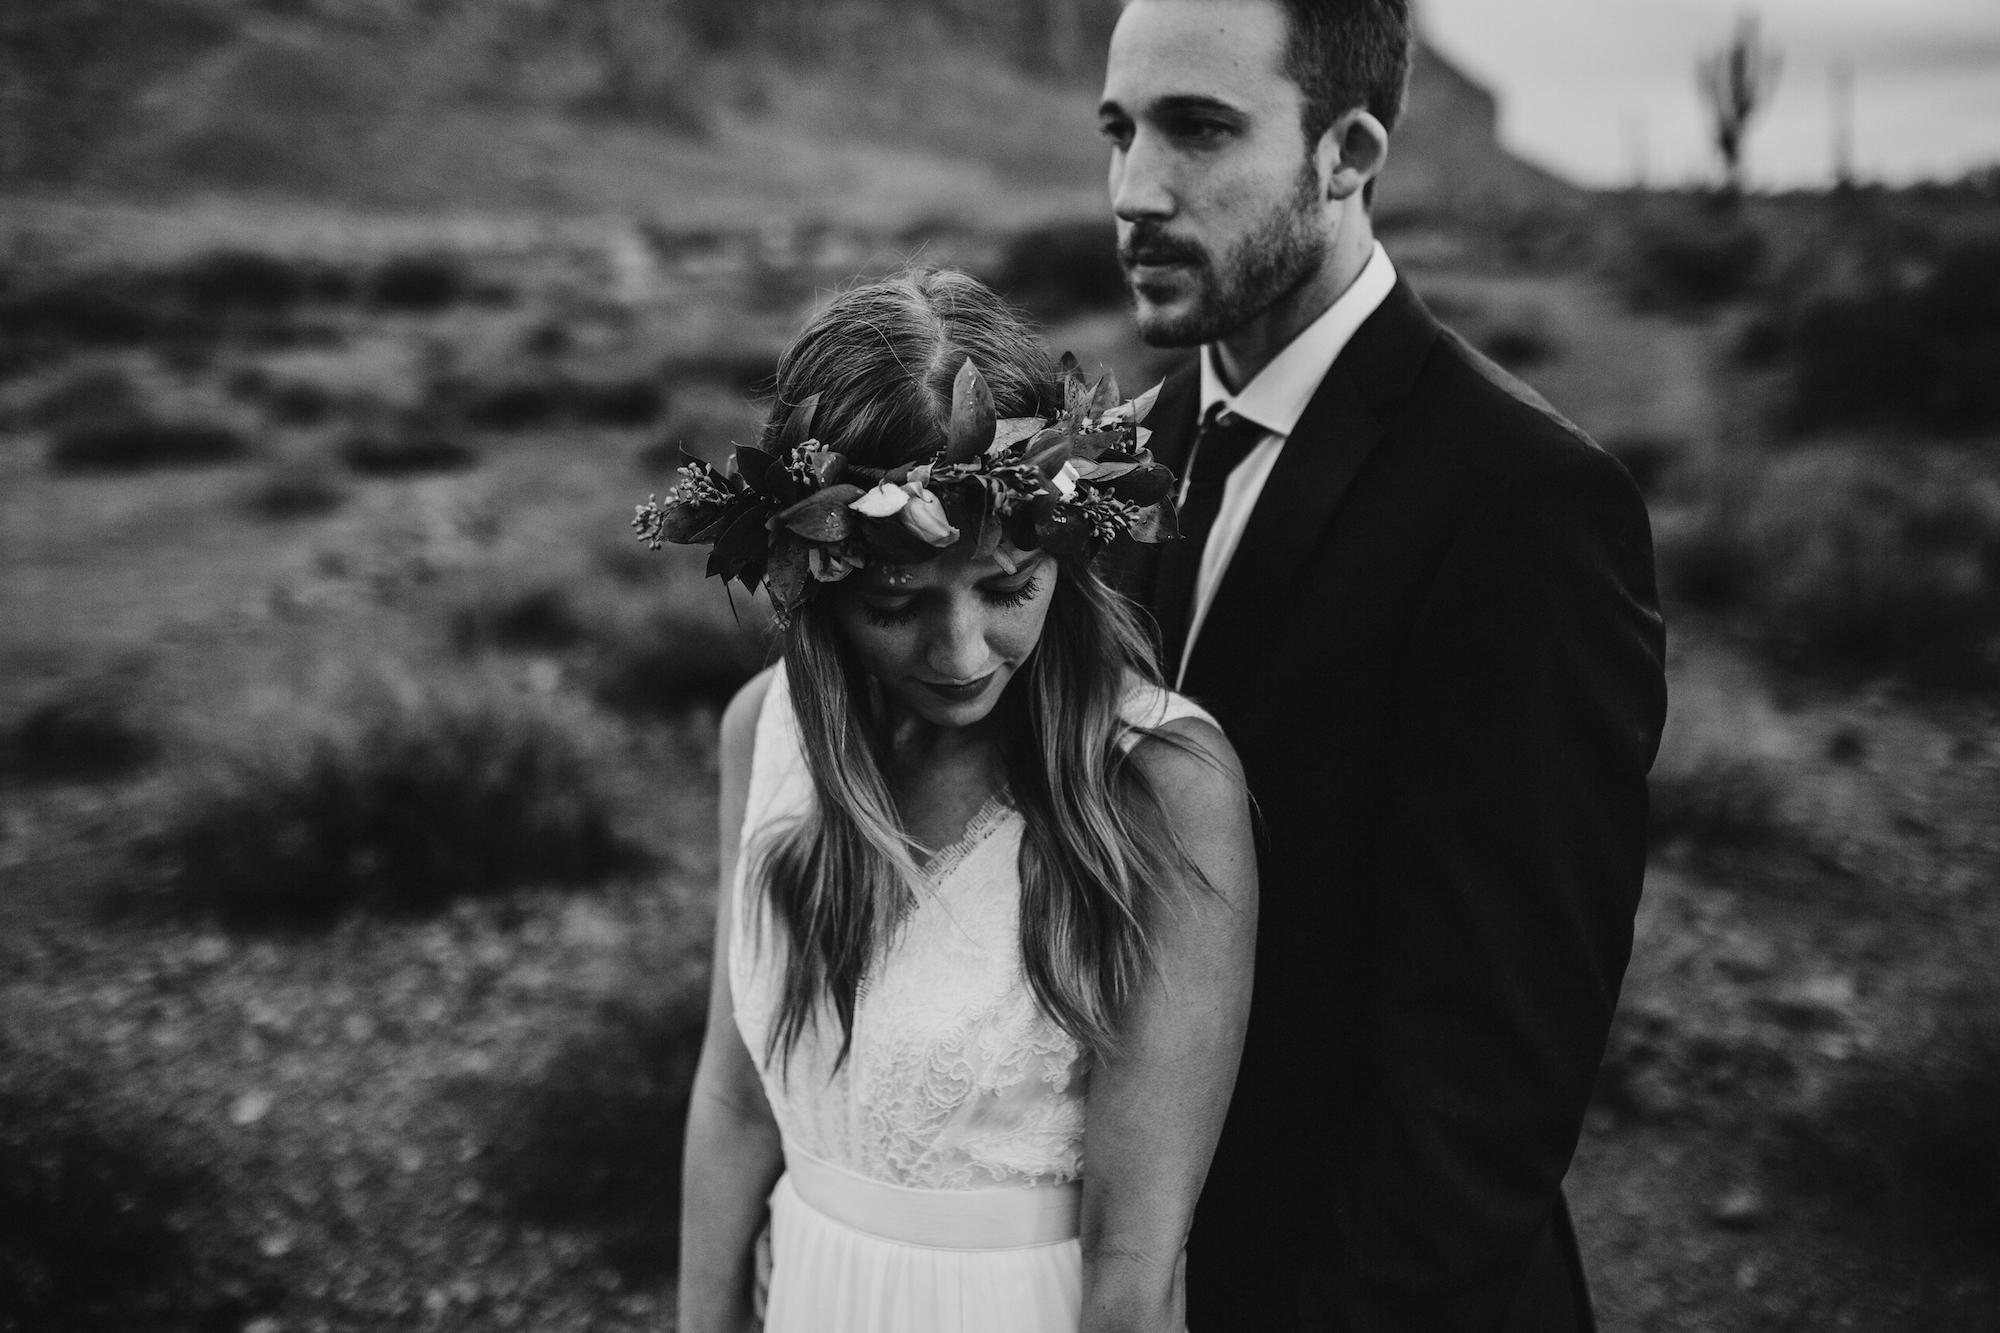 arizona - wedding - photographer819.jpg